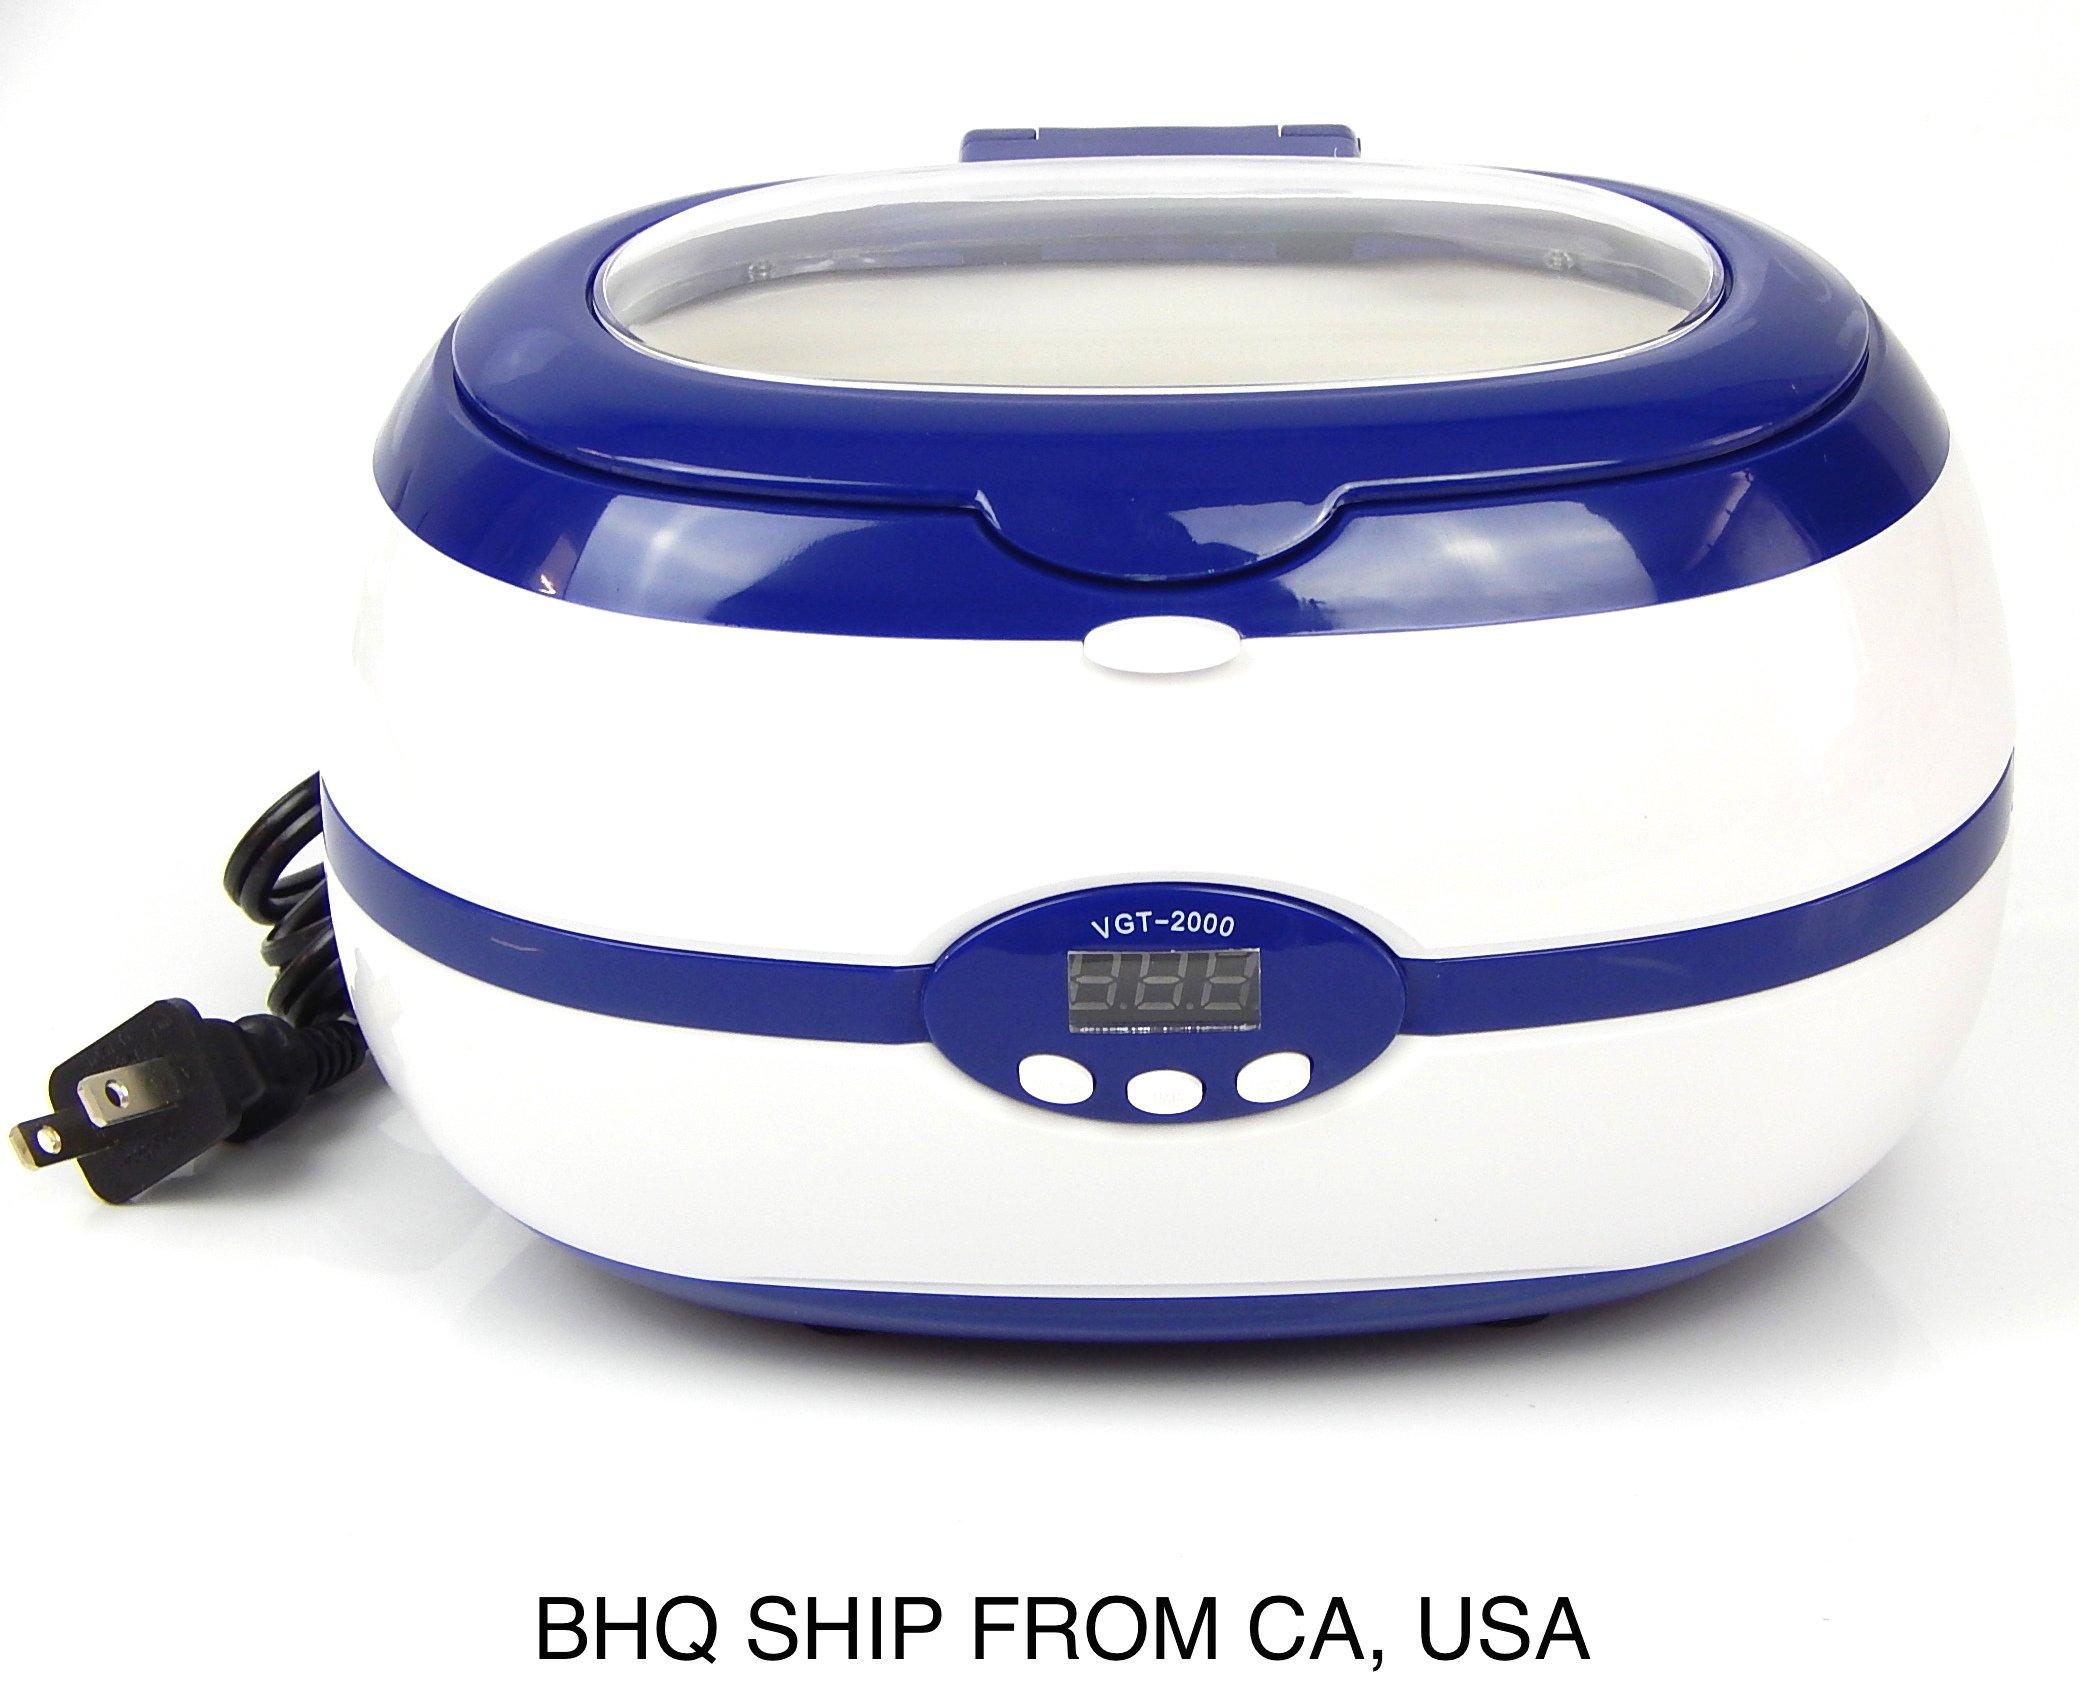 NEW Digital Ultrasonic Cleaner 0.6 Liters 600ml Capacity / Tattoo Equipment